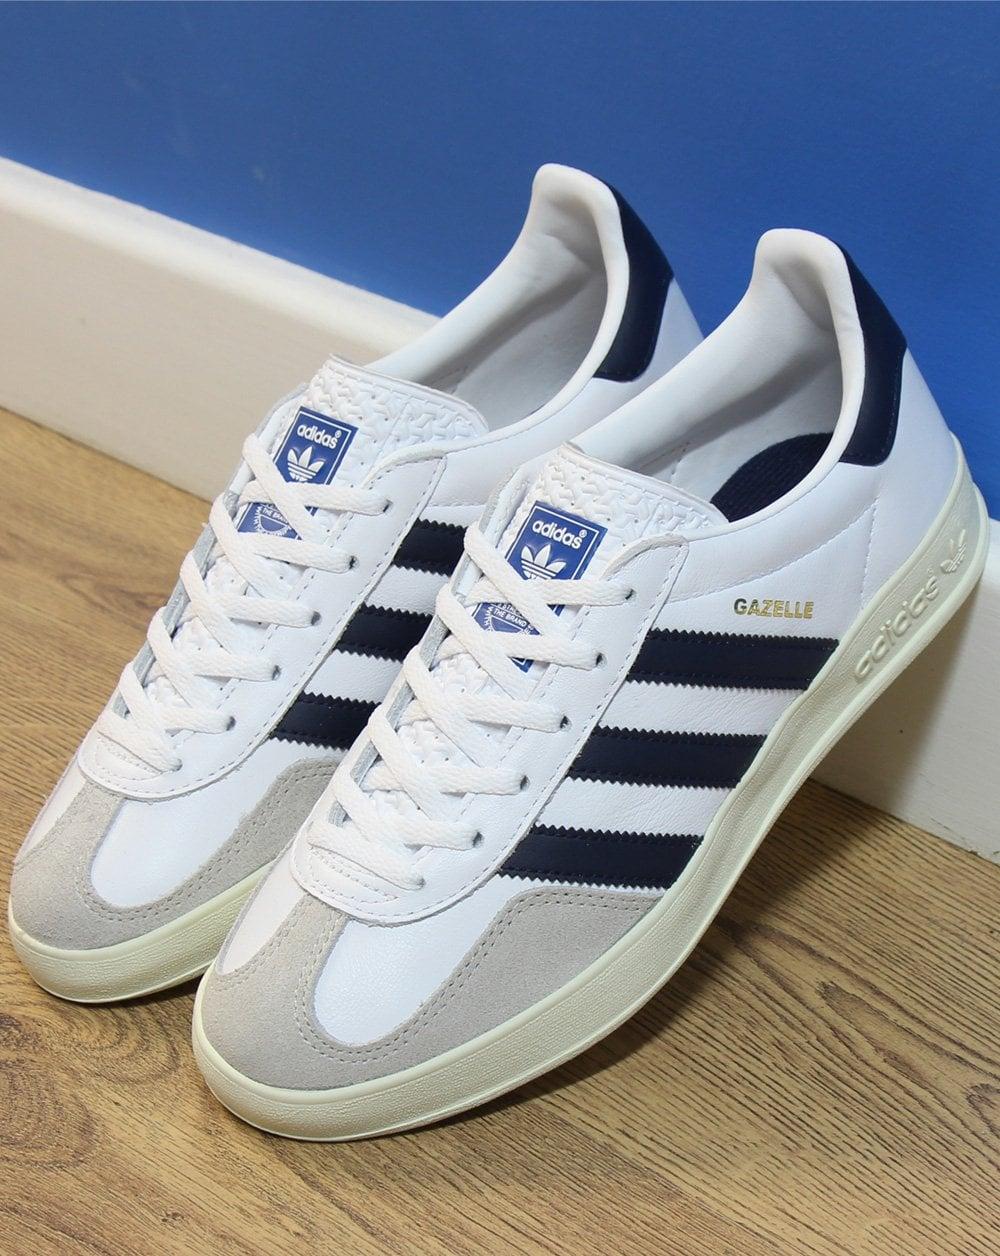 Adidas Gazelle Indoor Trainers White/Navy